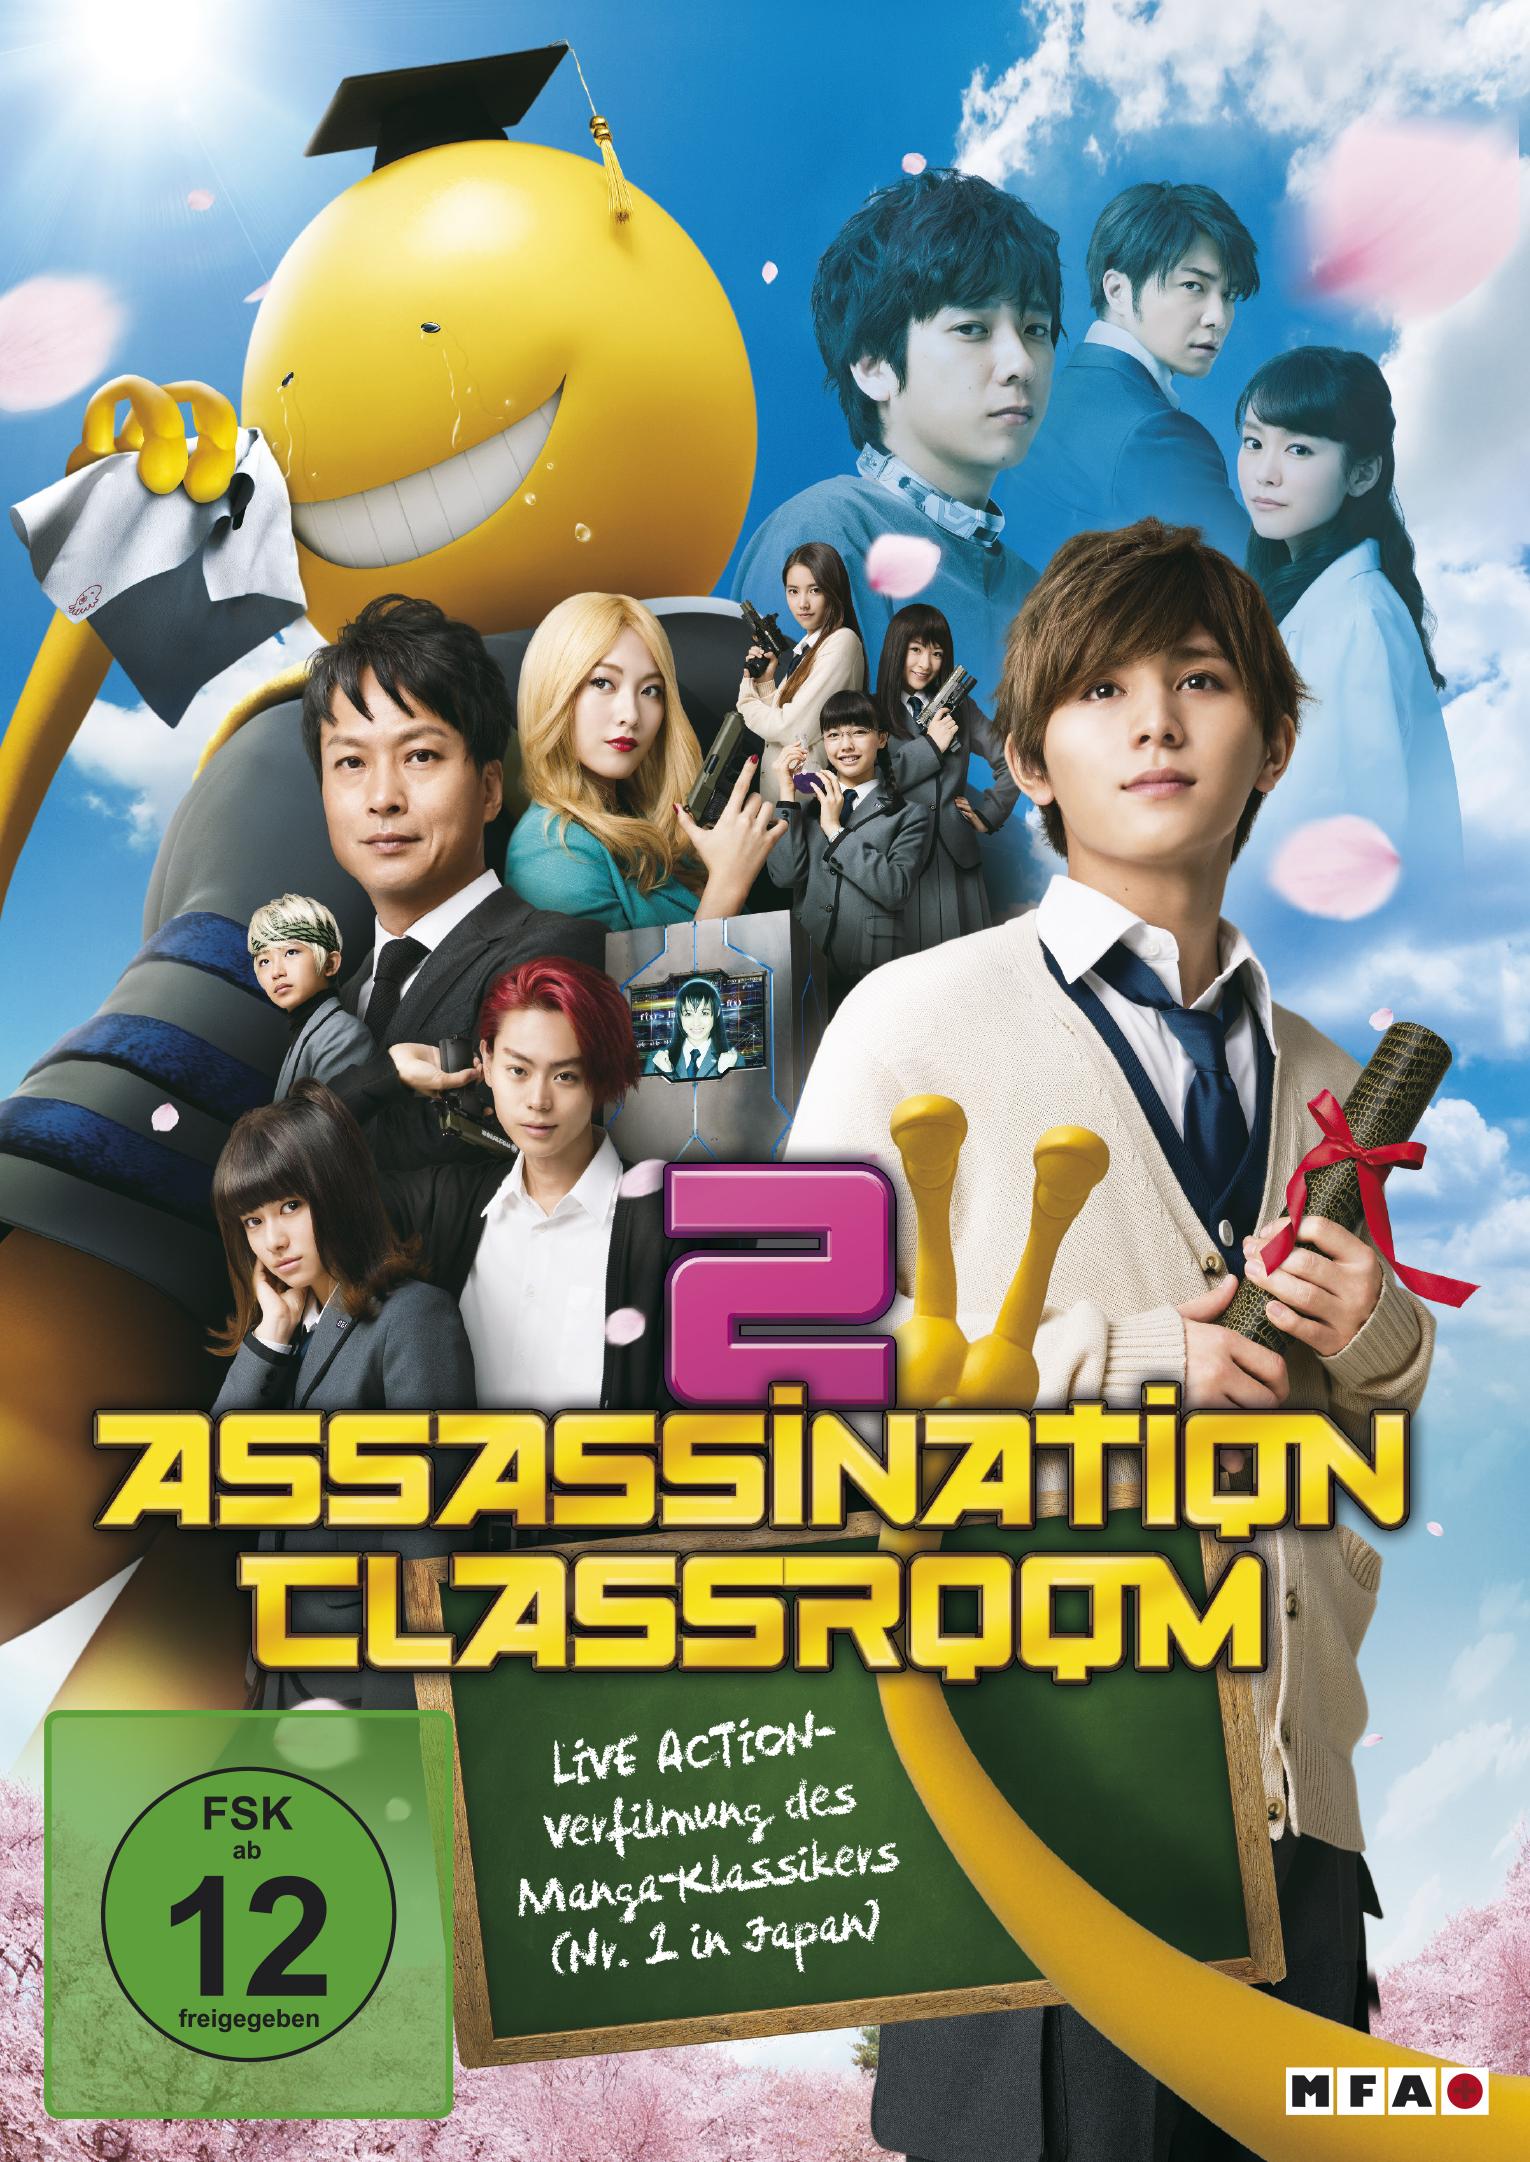 Assassination Classroom 2 - MFA+ Filmdistribution